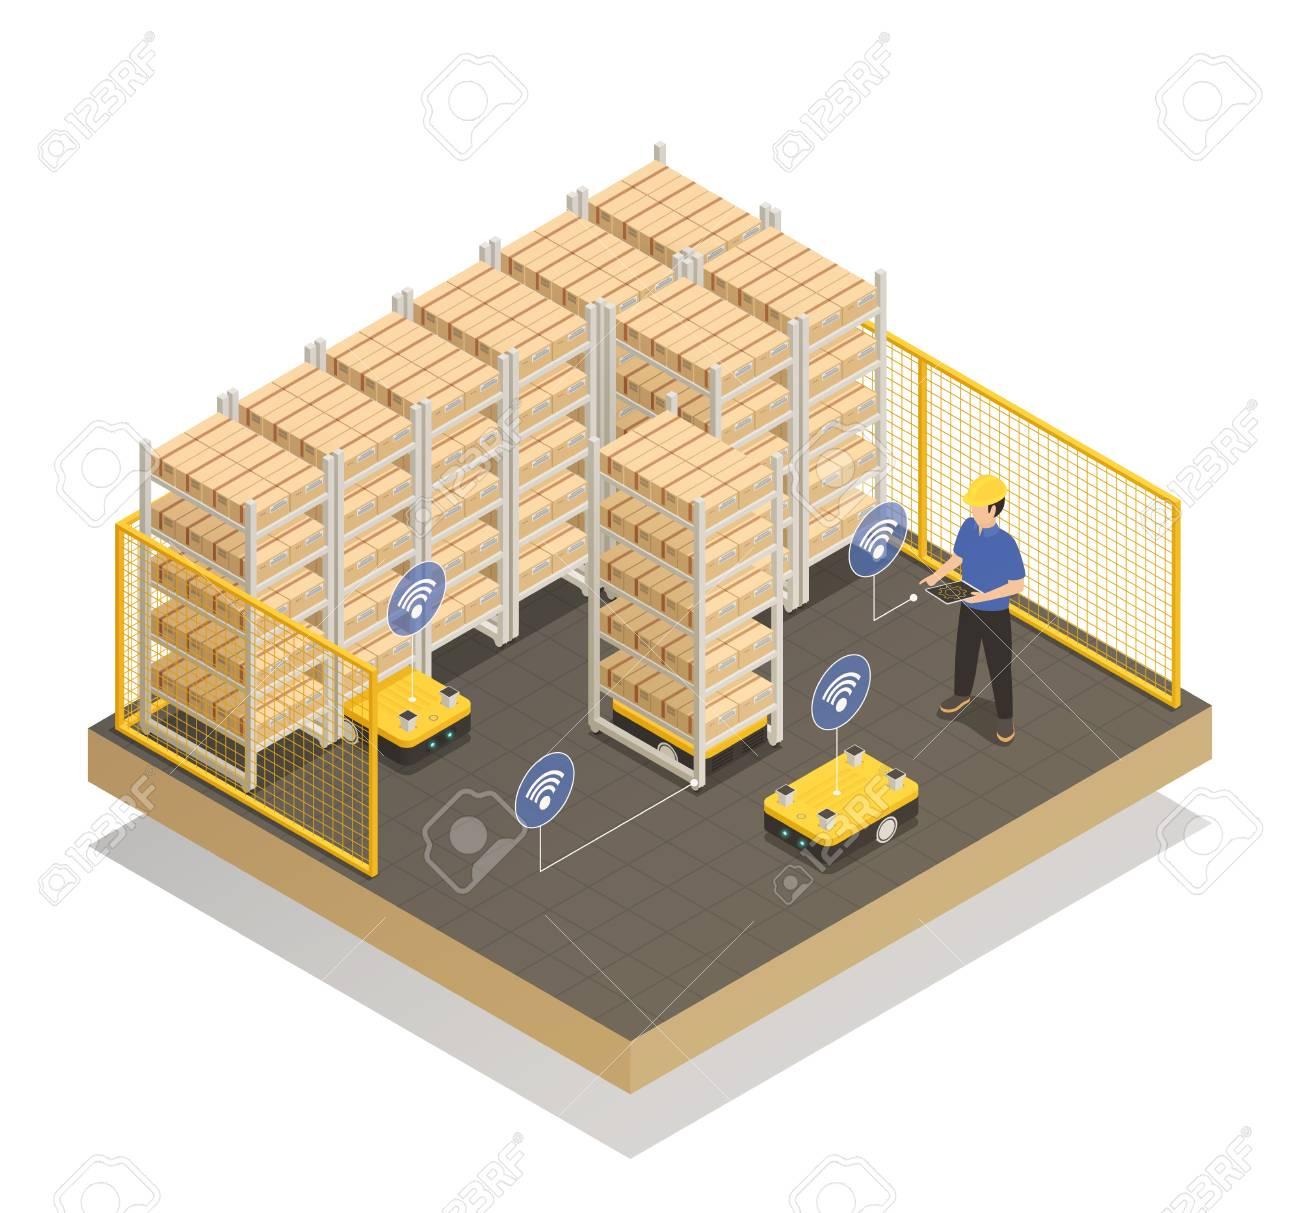 Smart industry machine intelligence in manufacturing storage unit - 96836901